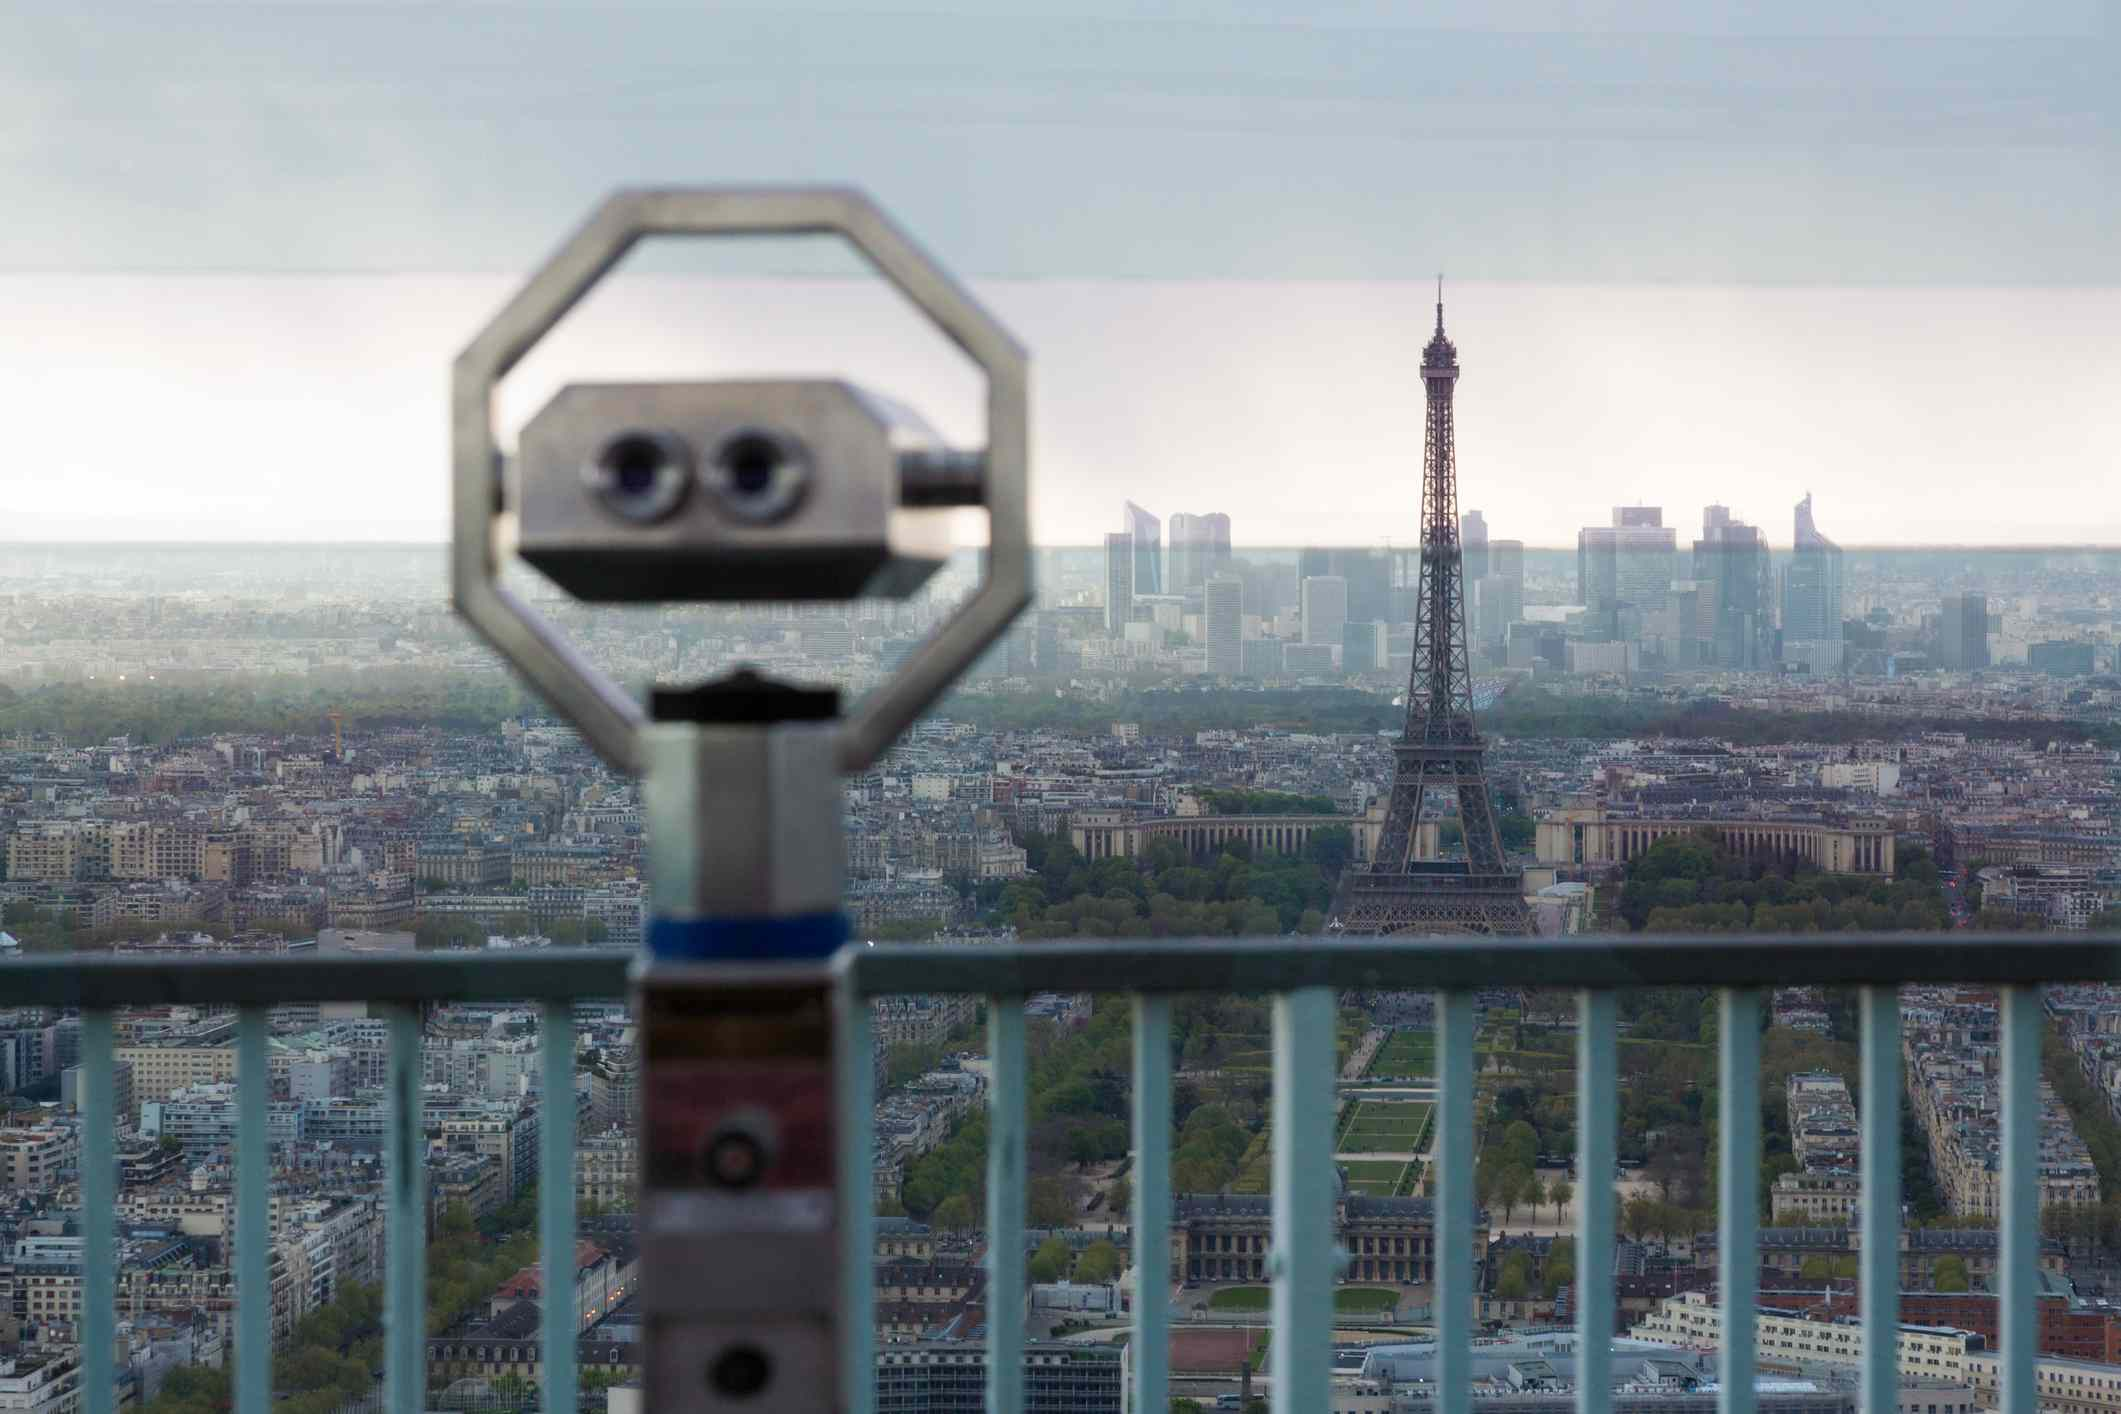 Observation deck overviewing Paris from Tour Montparnasse